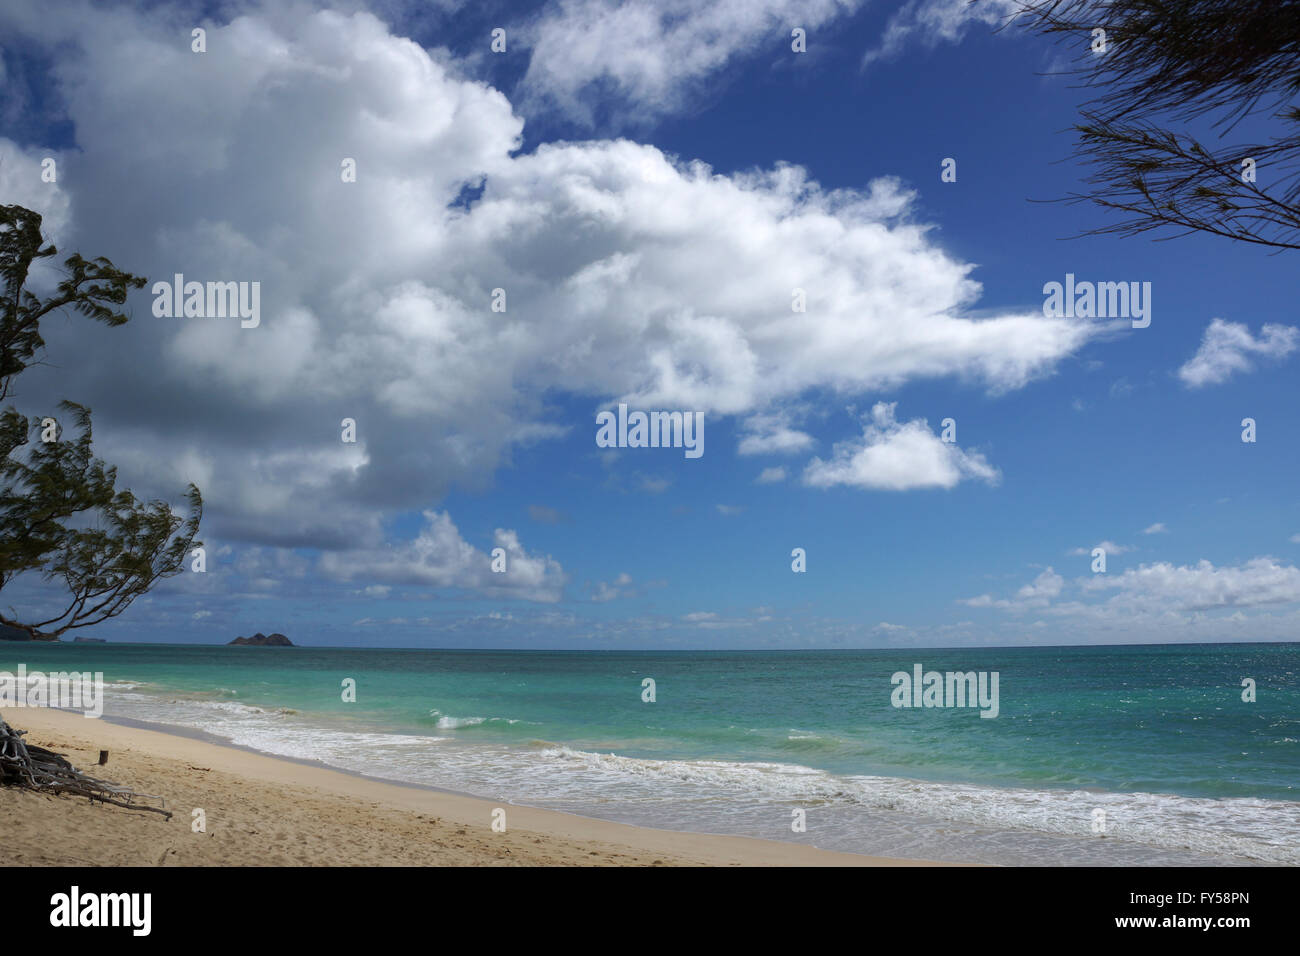 Gentle wave lap on Waimanalo Beach looking towards Mokulua islands on a nice day Oahu, Hawaii. July 2014. - Stock Image